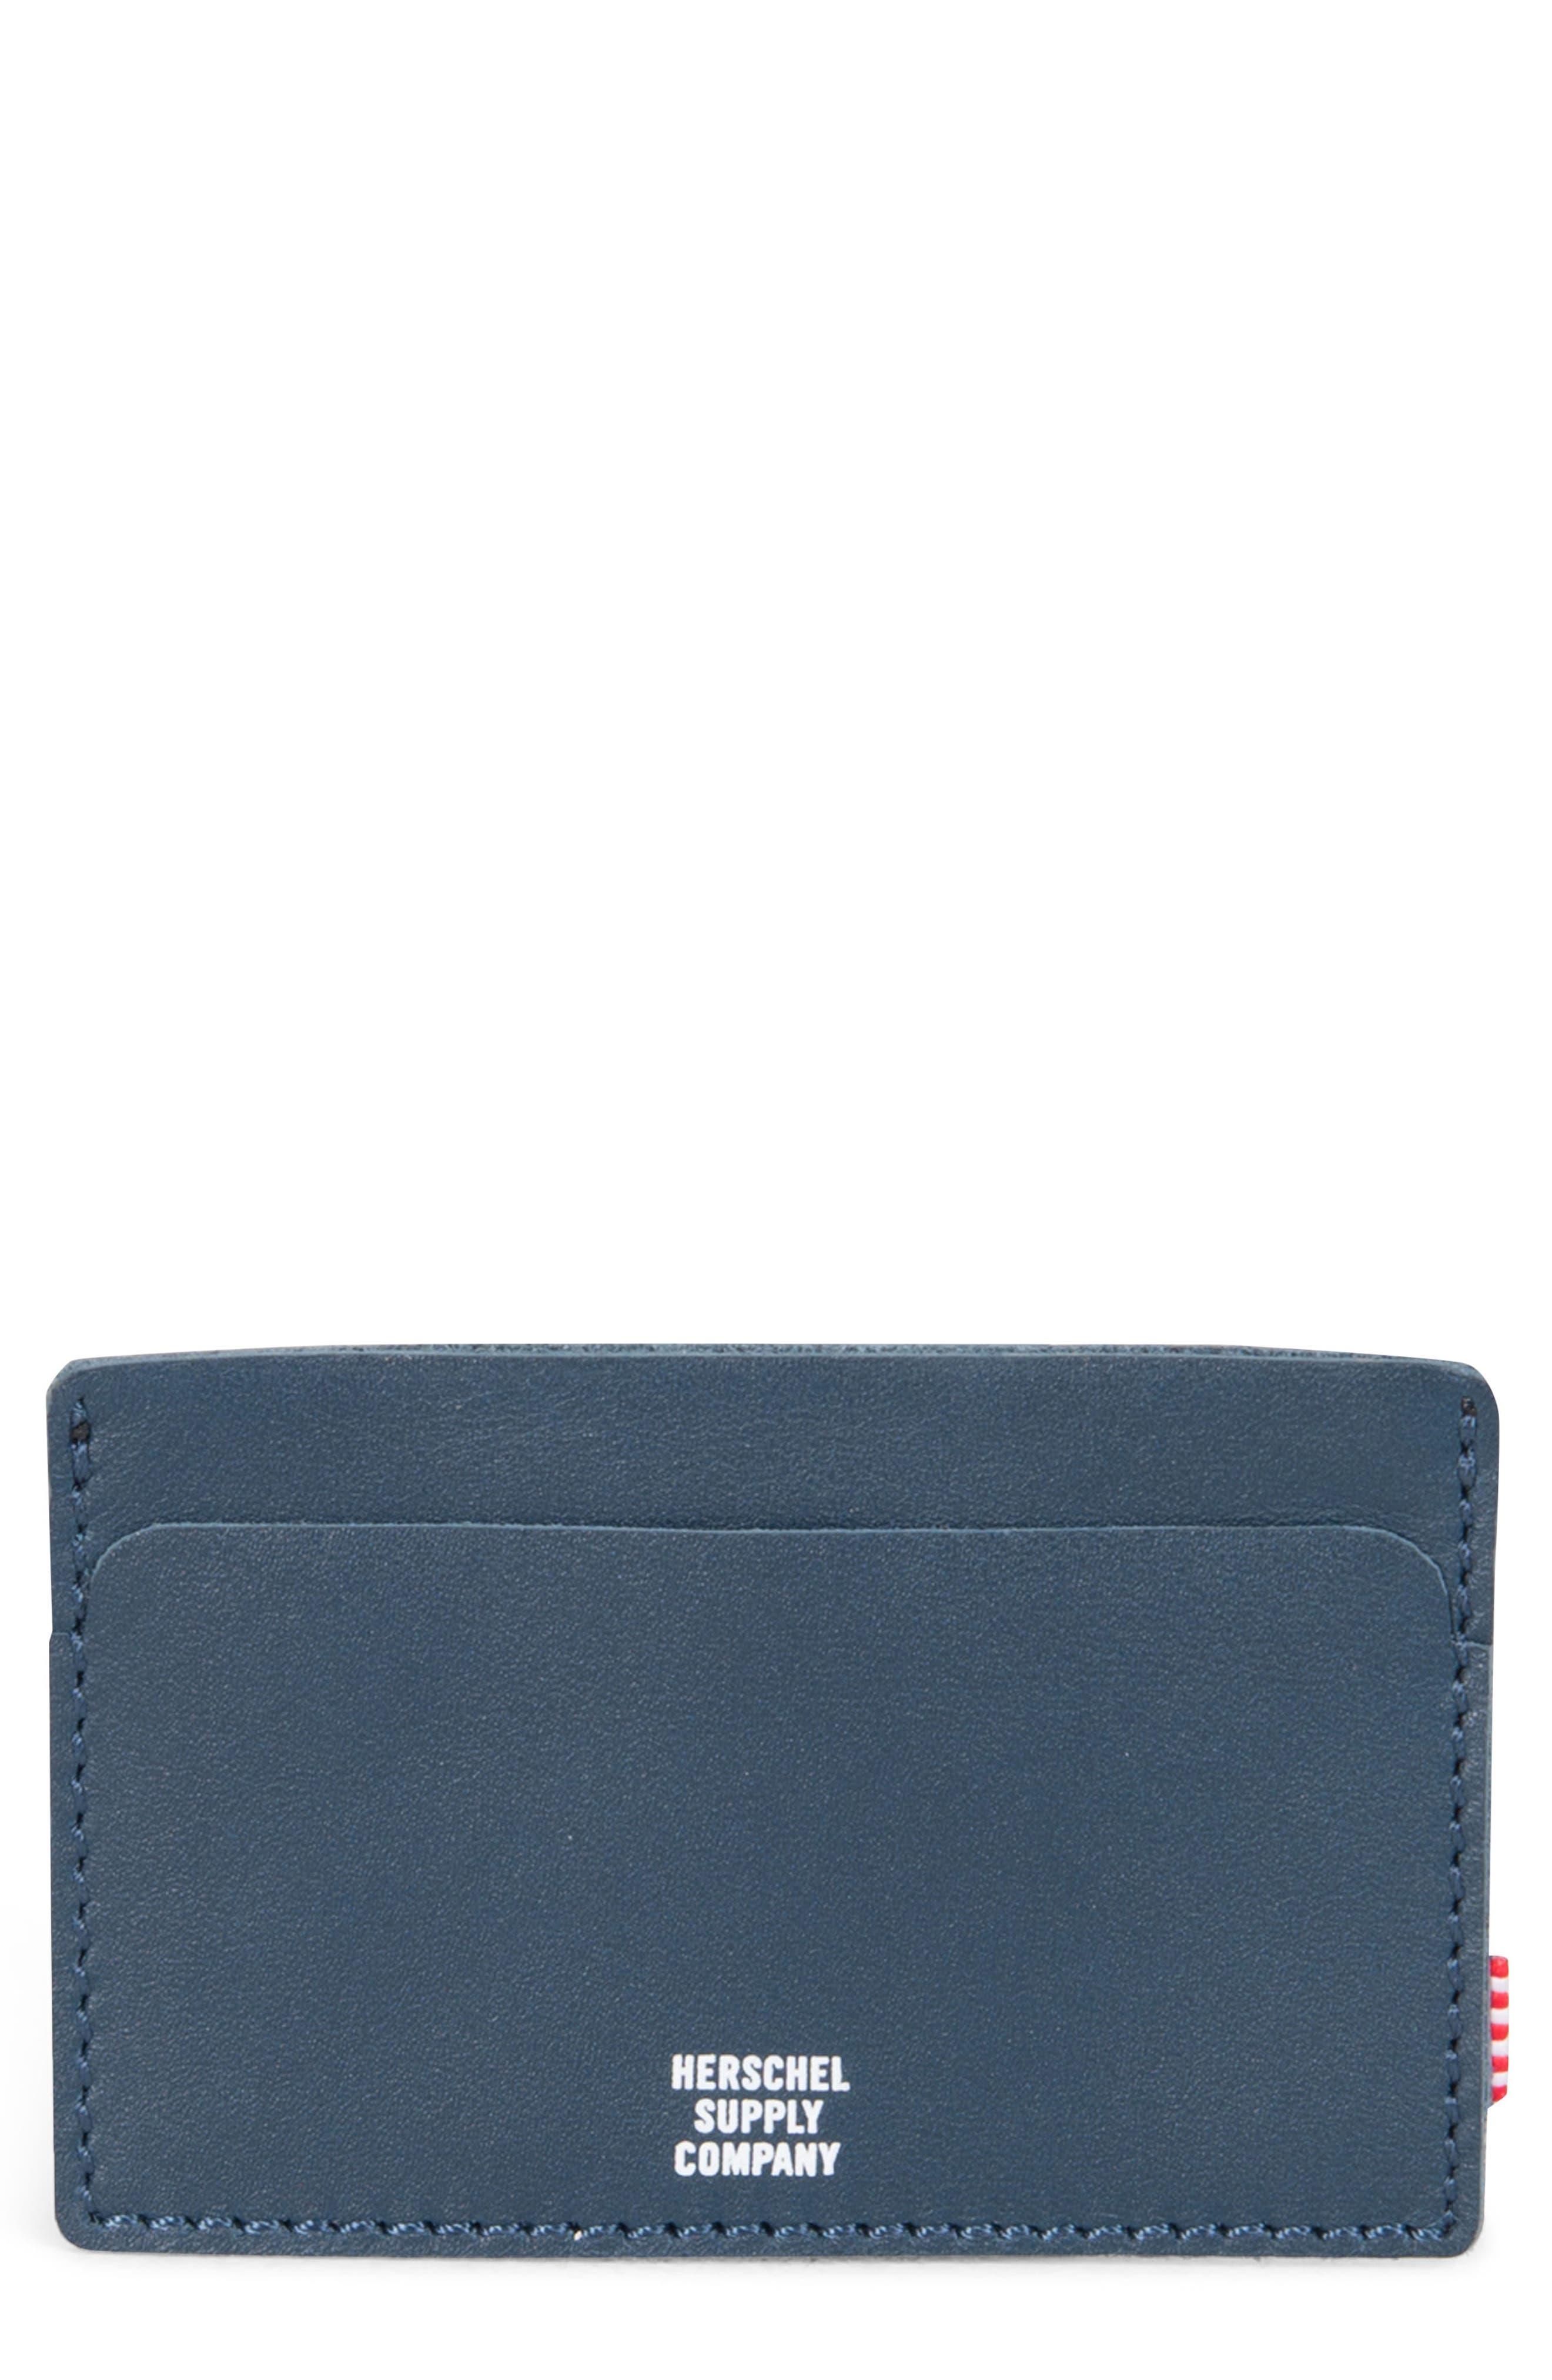 Felix Card Case,                         Main,                         color, Peacoat Leather